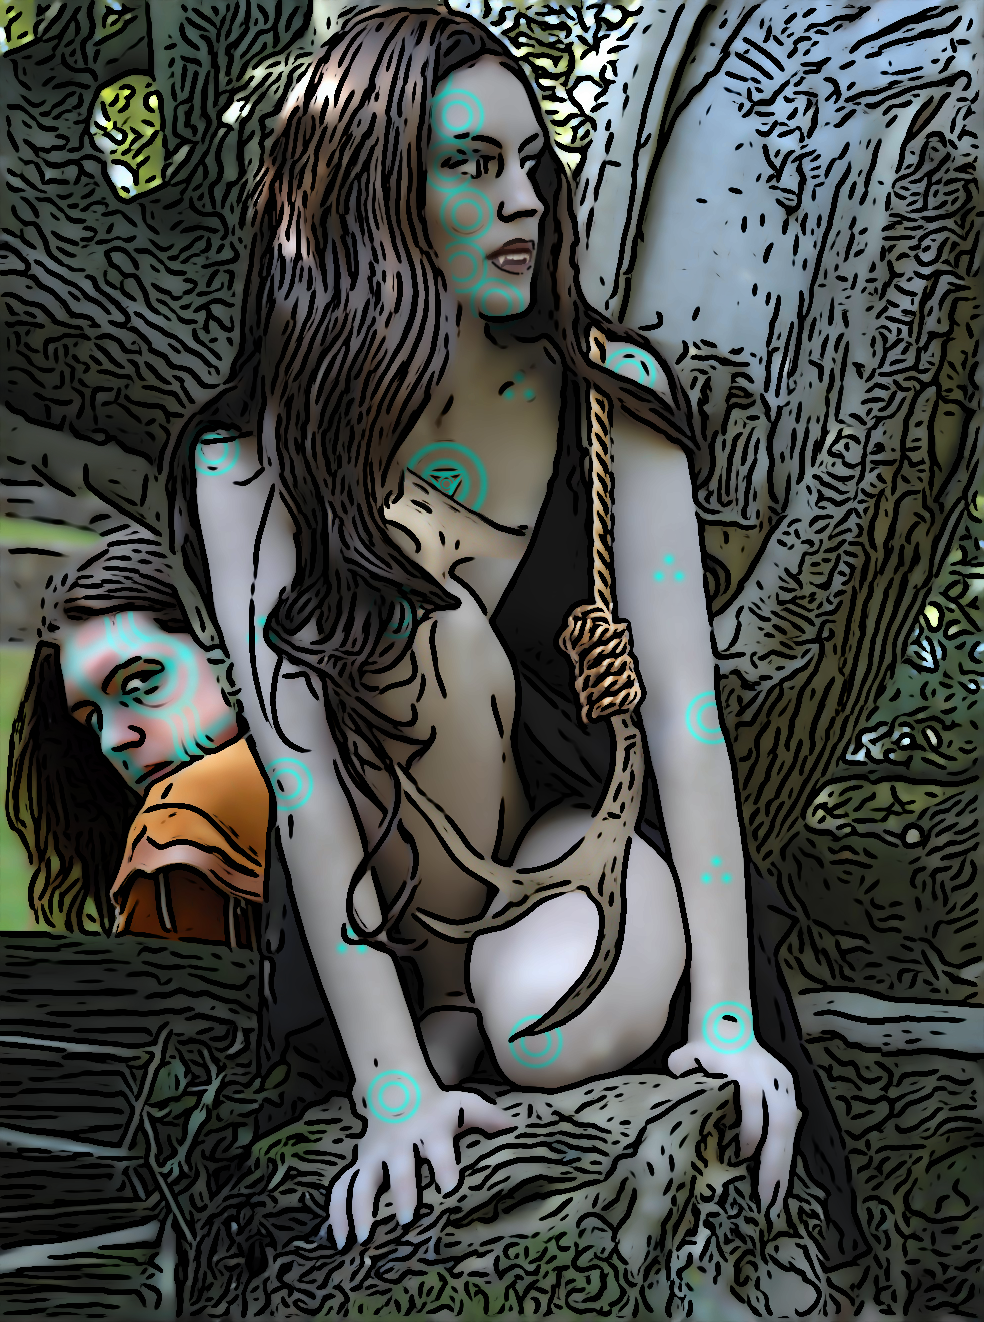 Alia and Roe by SybilThorn